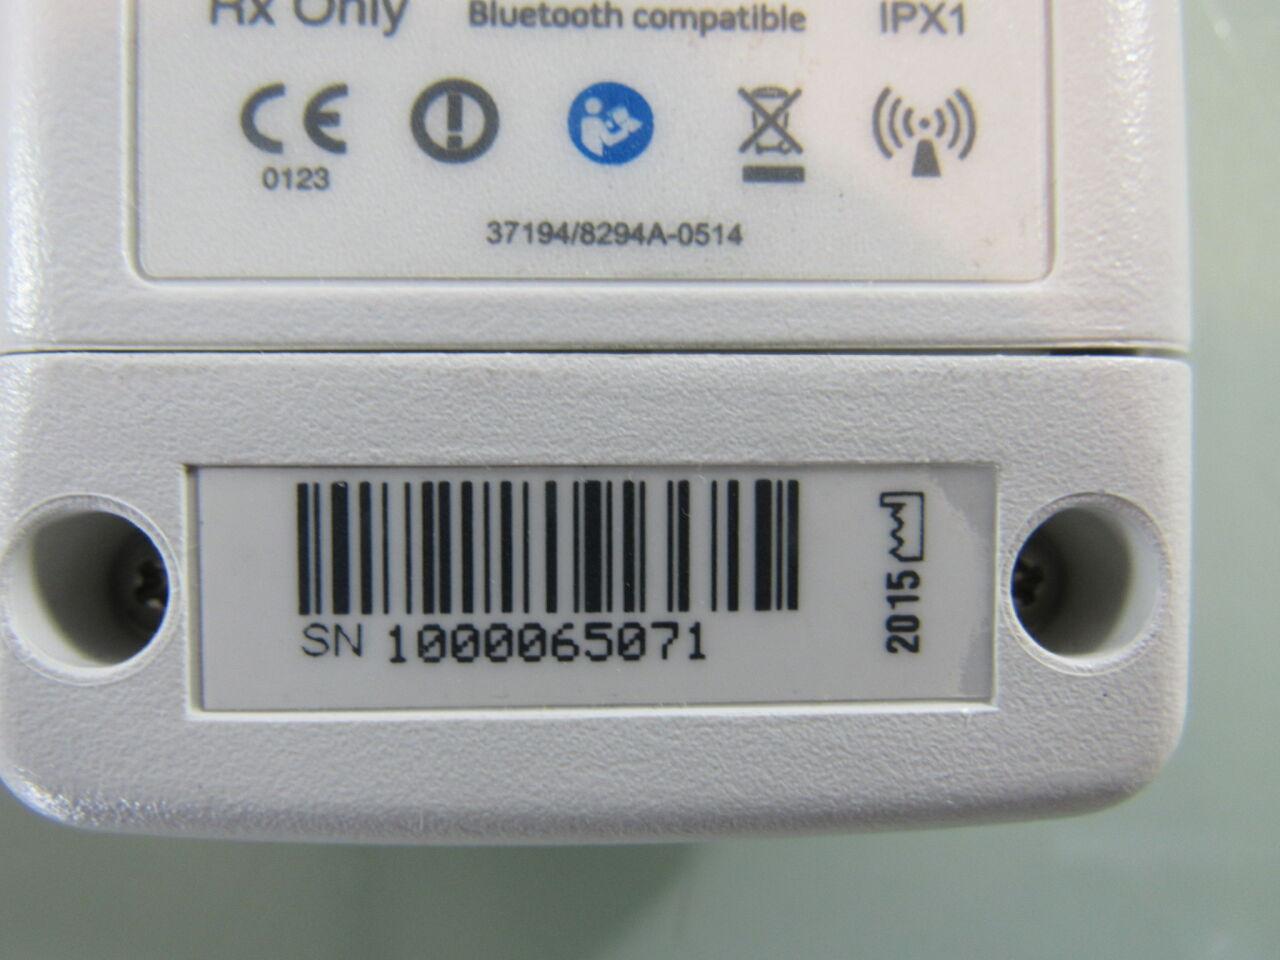 MASIMO Radical 7  - Lot of 3 Oximeter - Pulse